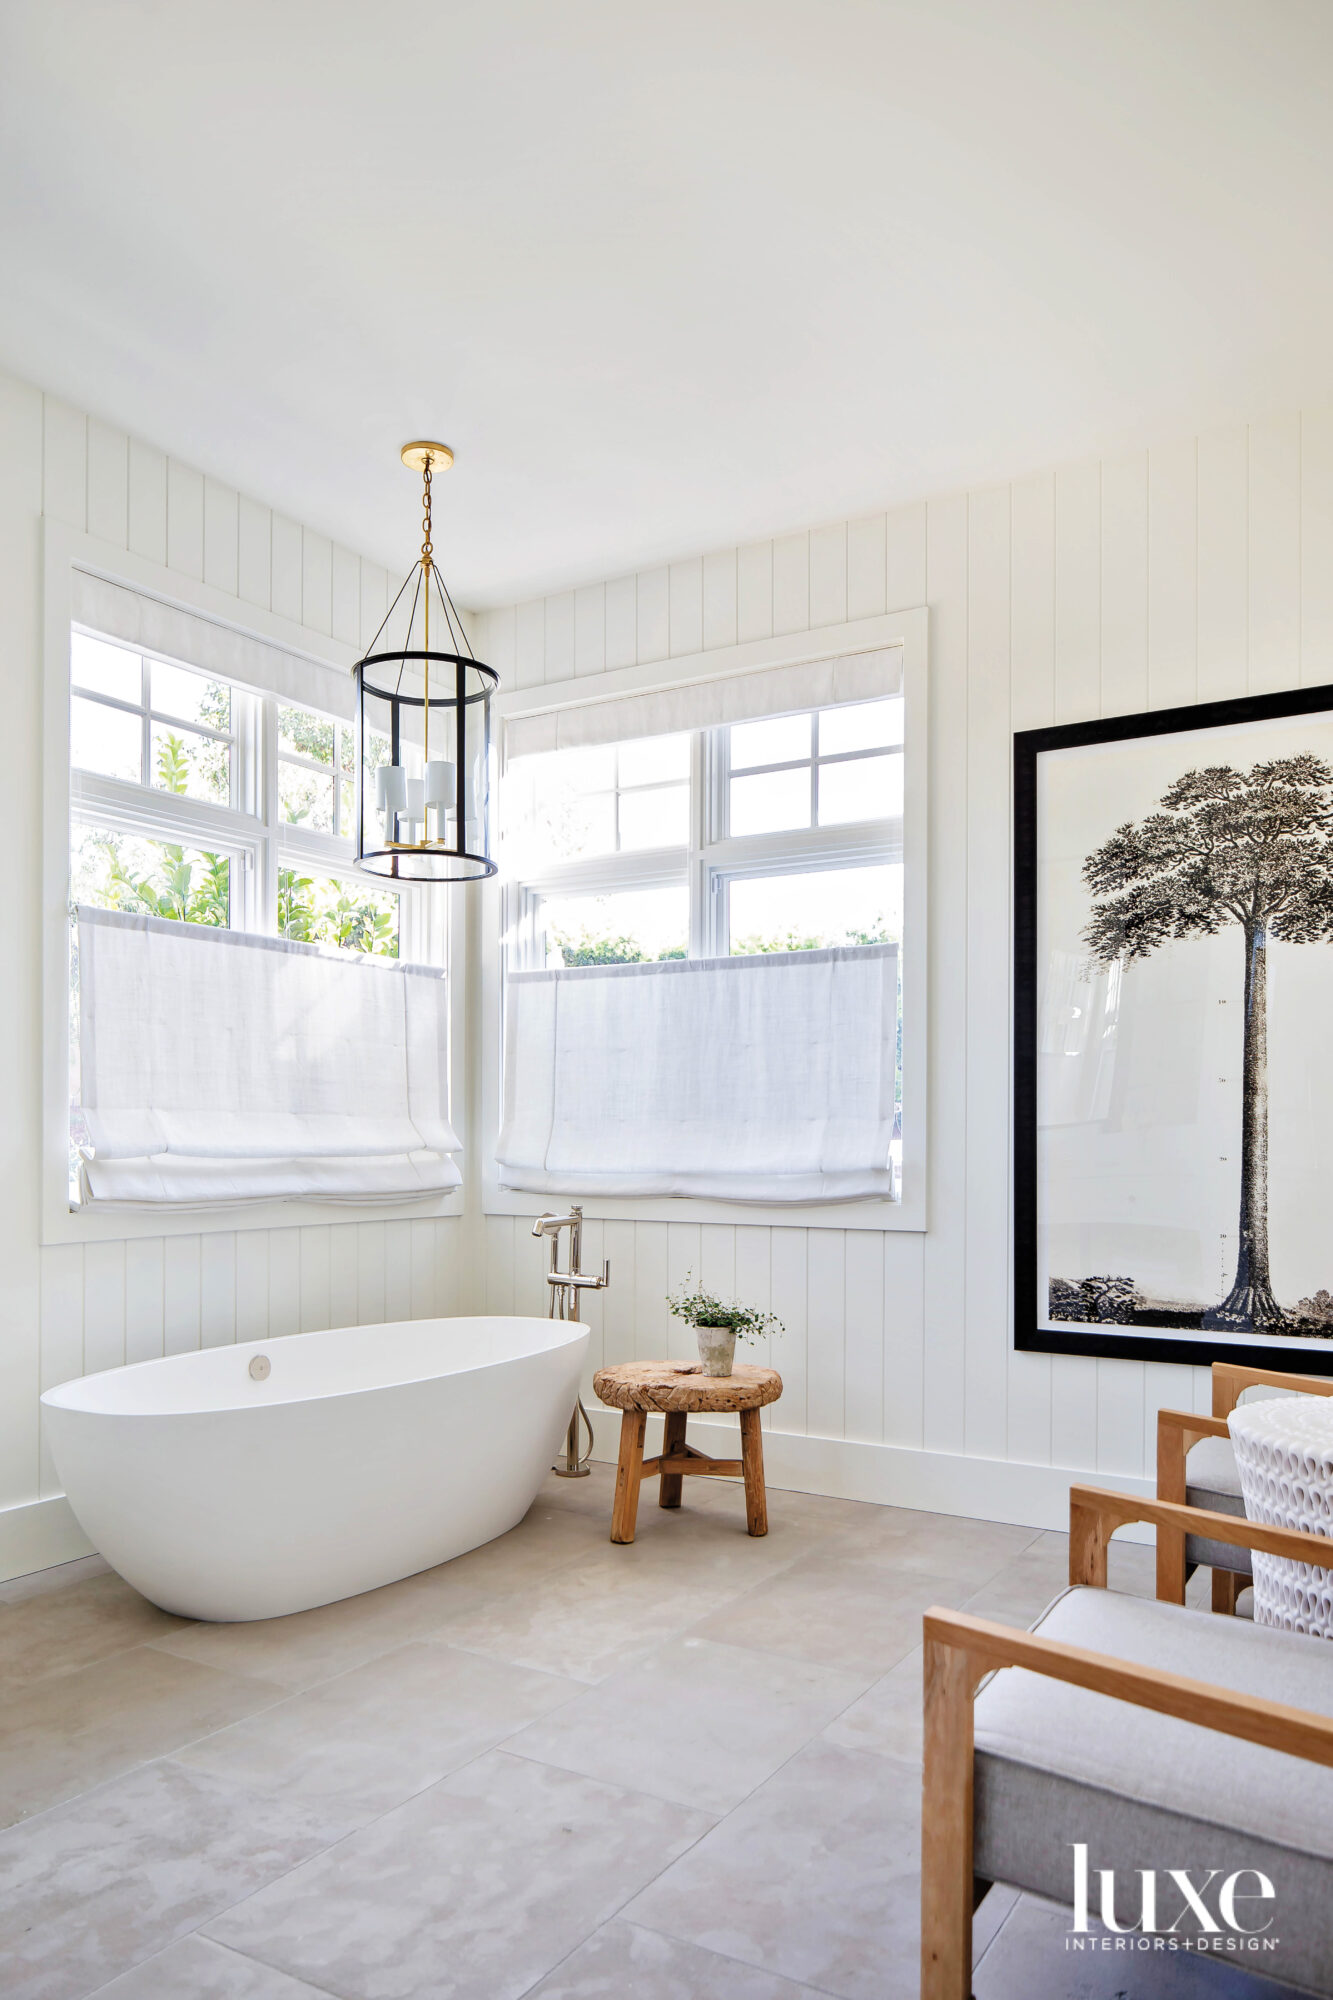 Main bathroom with freestanding tub